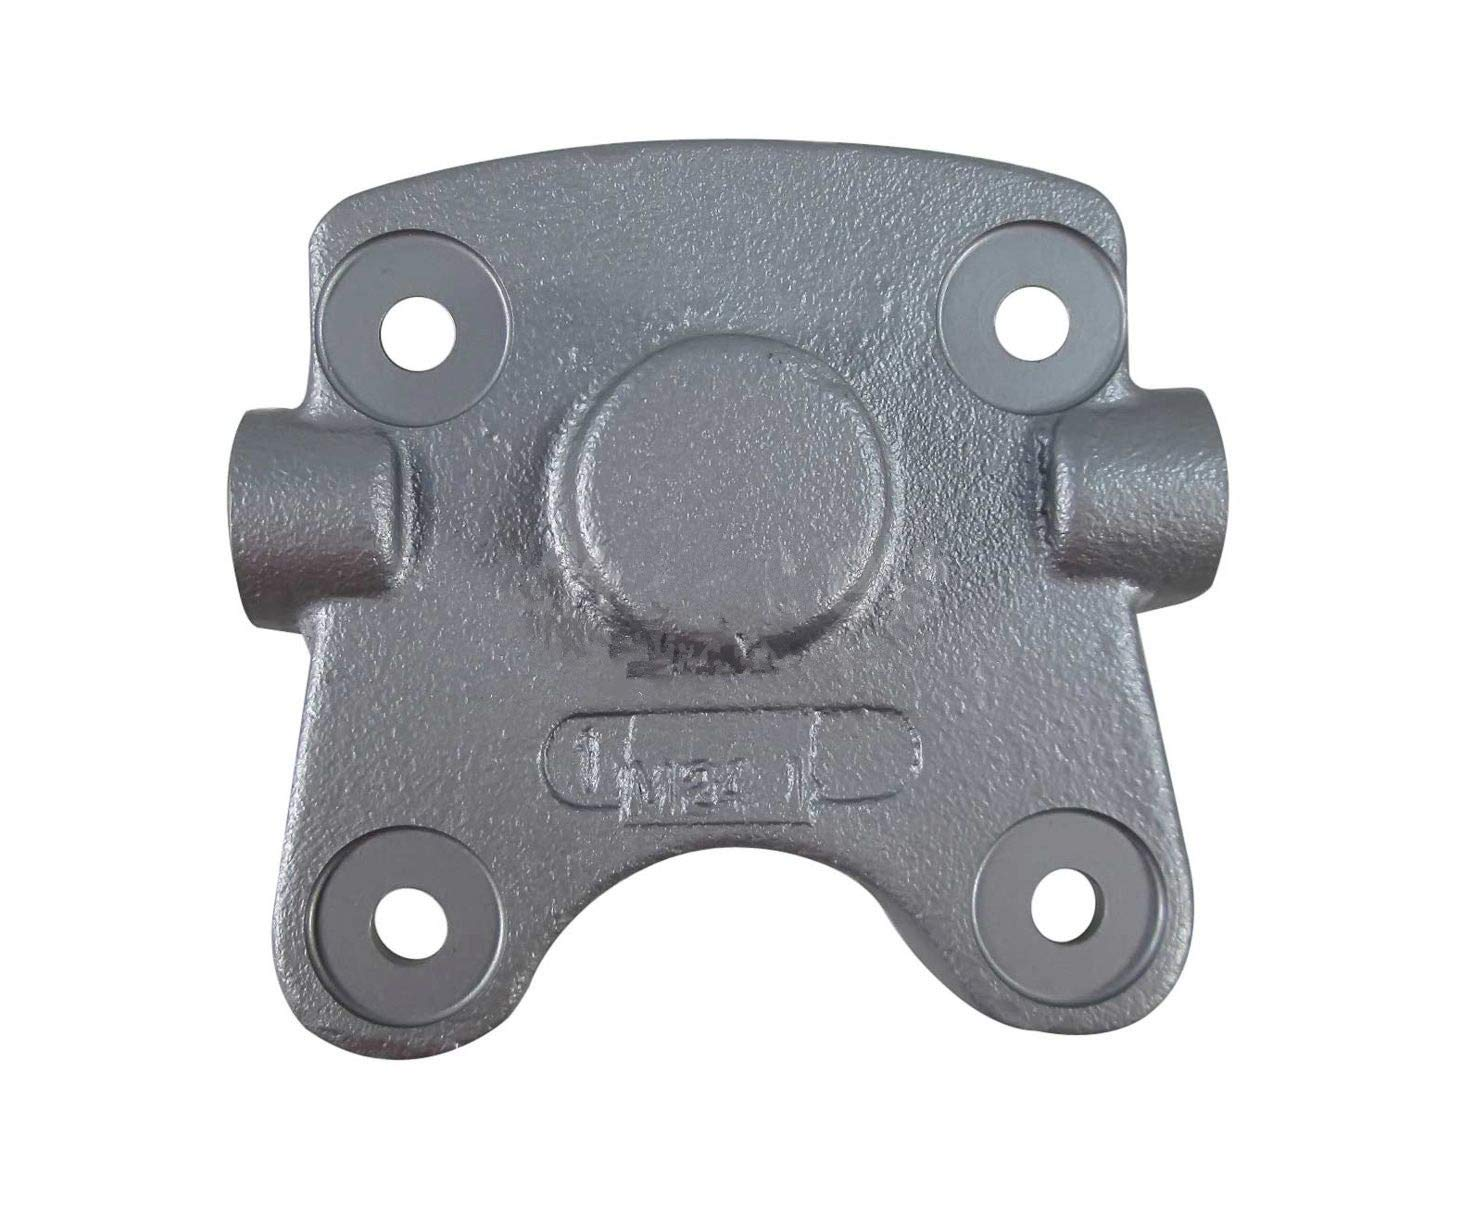 Cleveland Wheel & Brake 061-00601 Cylinder by Cleveland Wheel & Brake